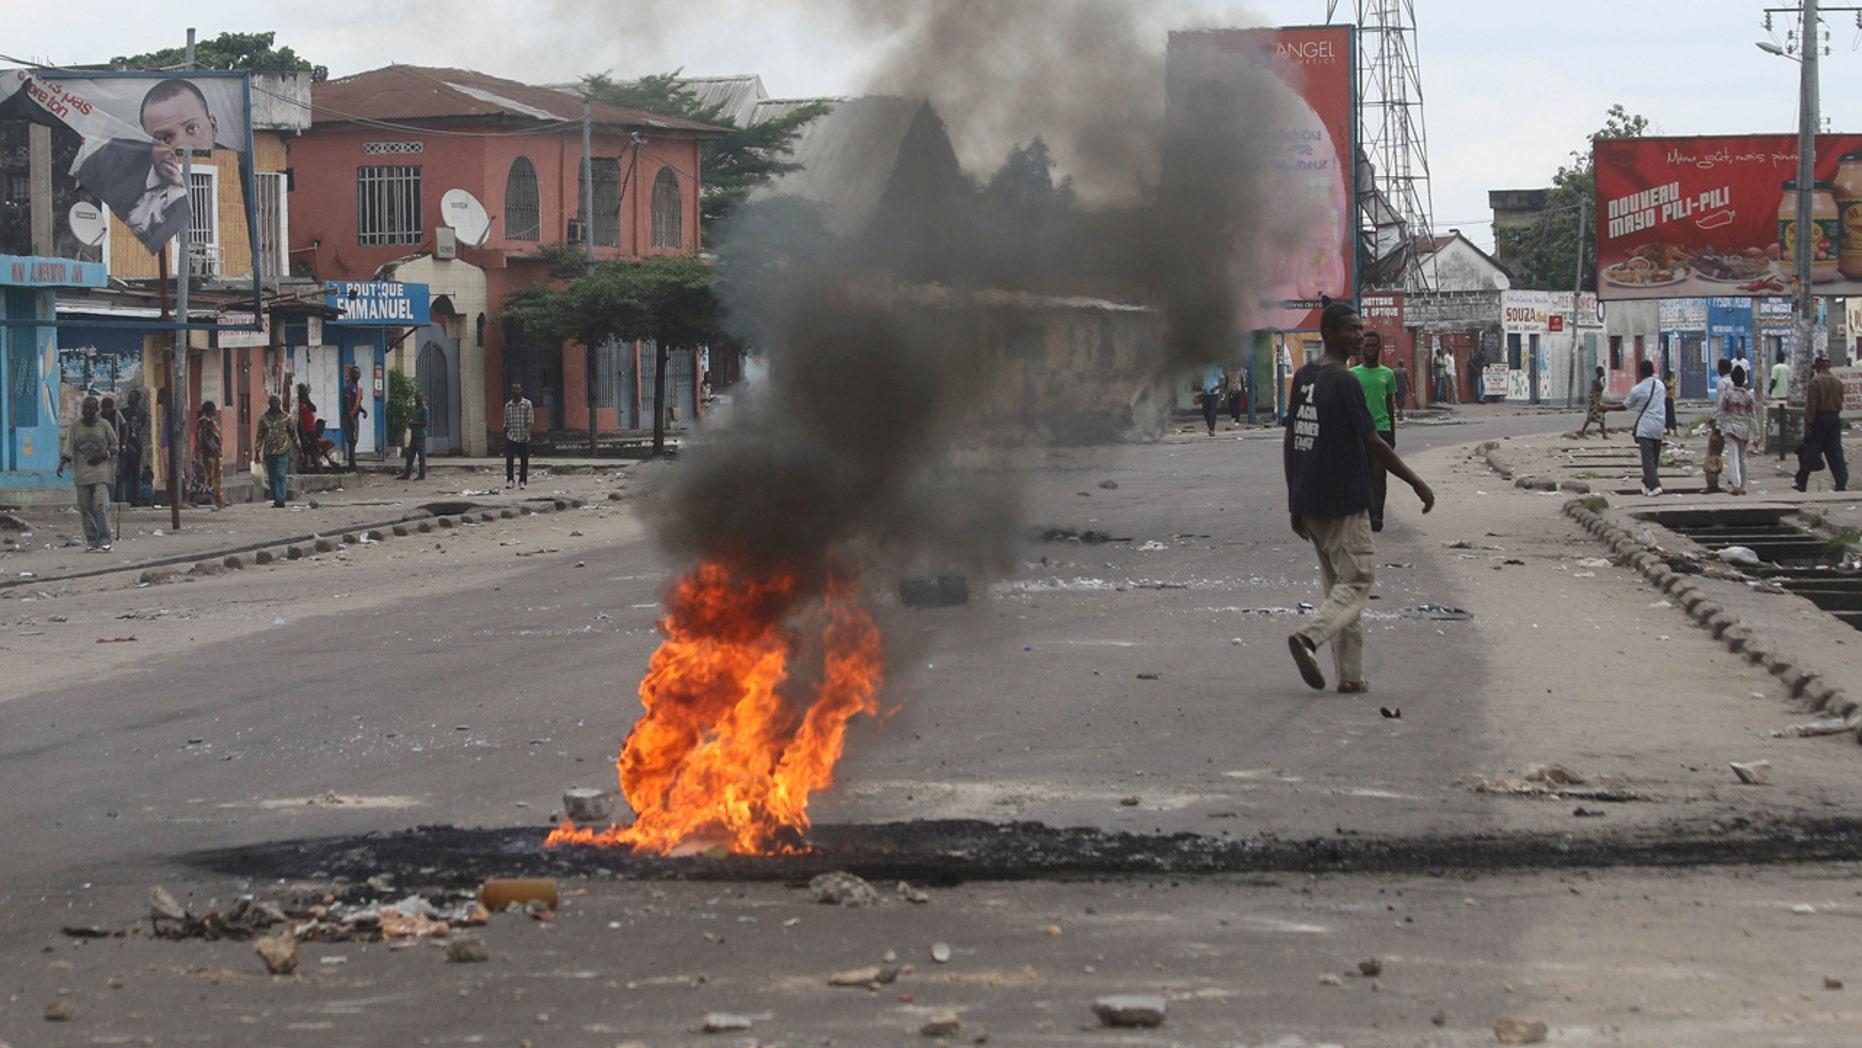 People walk near burning debris during protests in Kinshasa, Democratic Republic of Congo, Tuesday, Dec. 20, 2016.